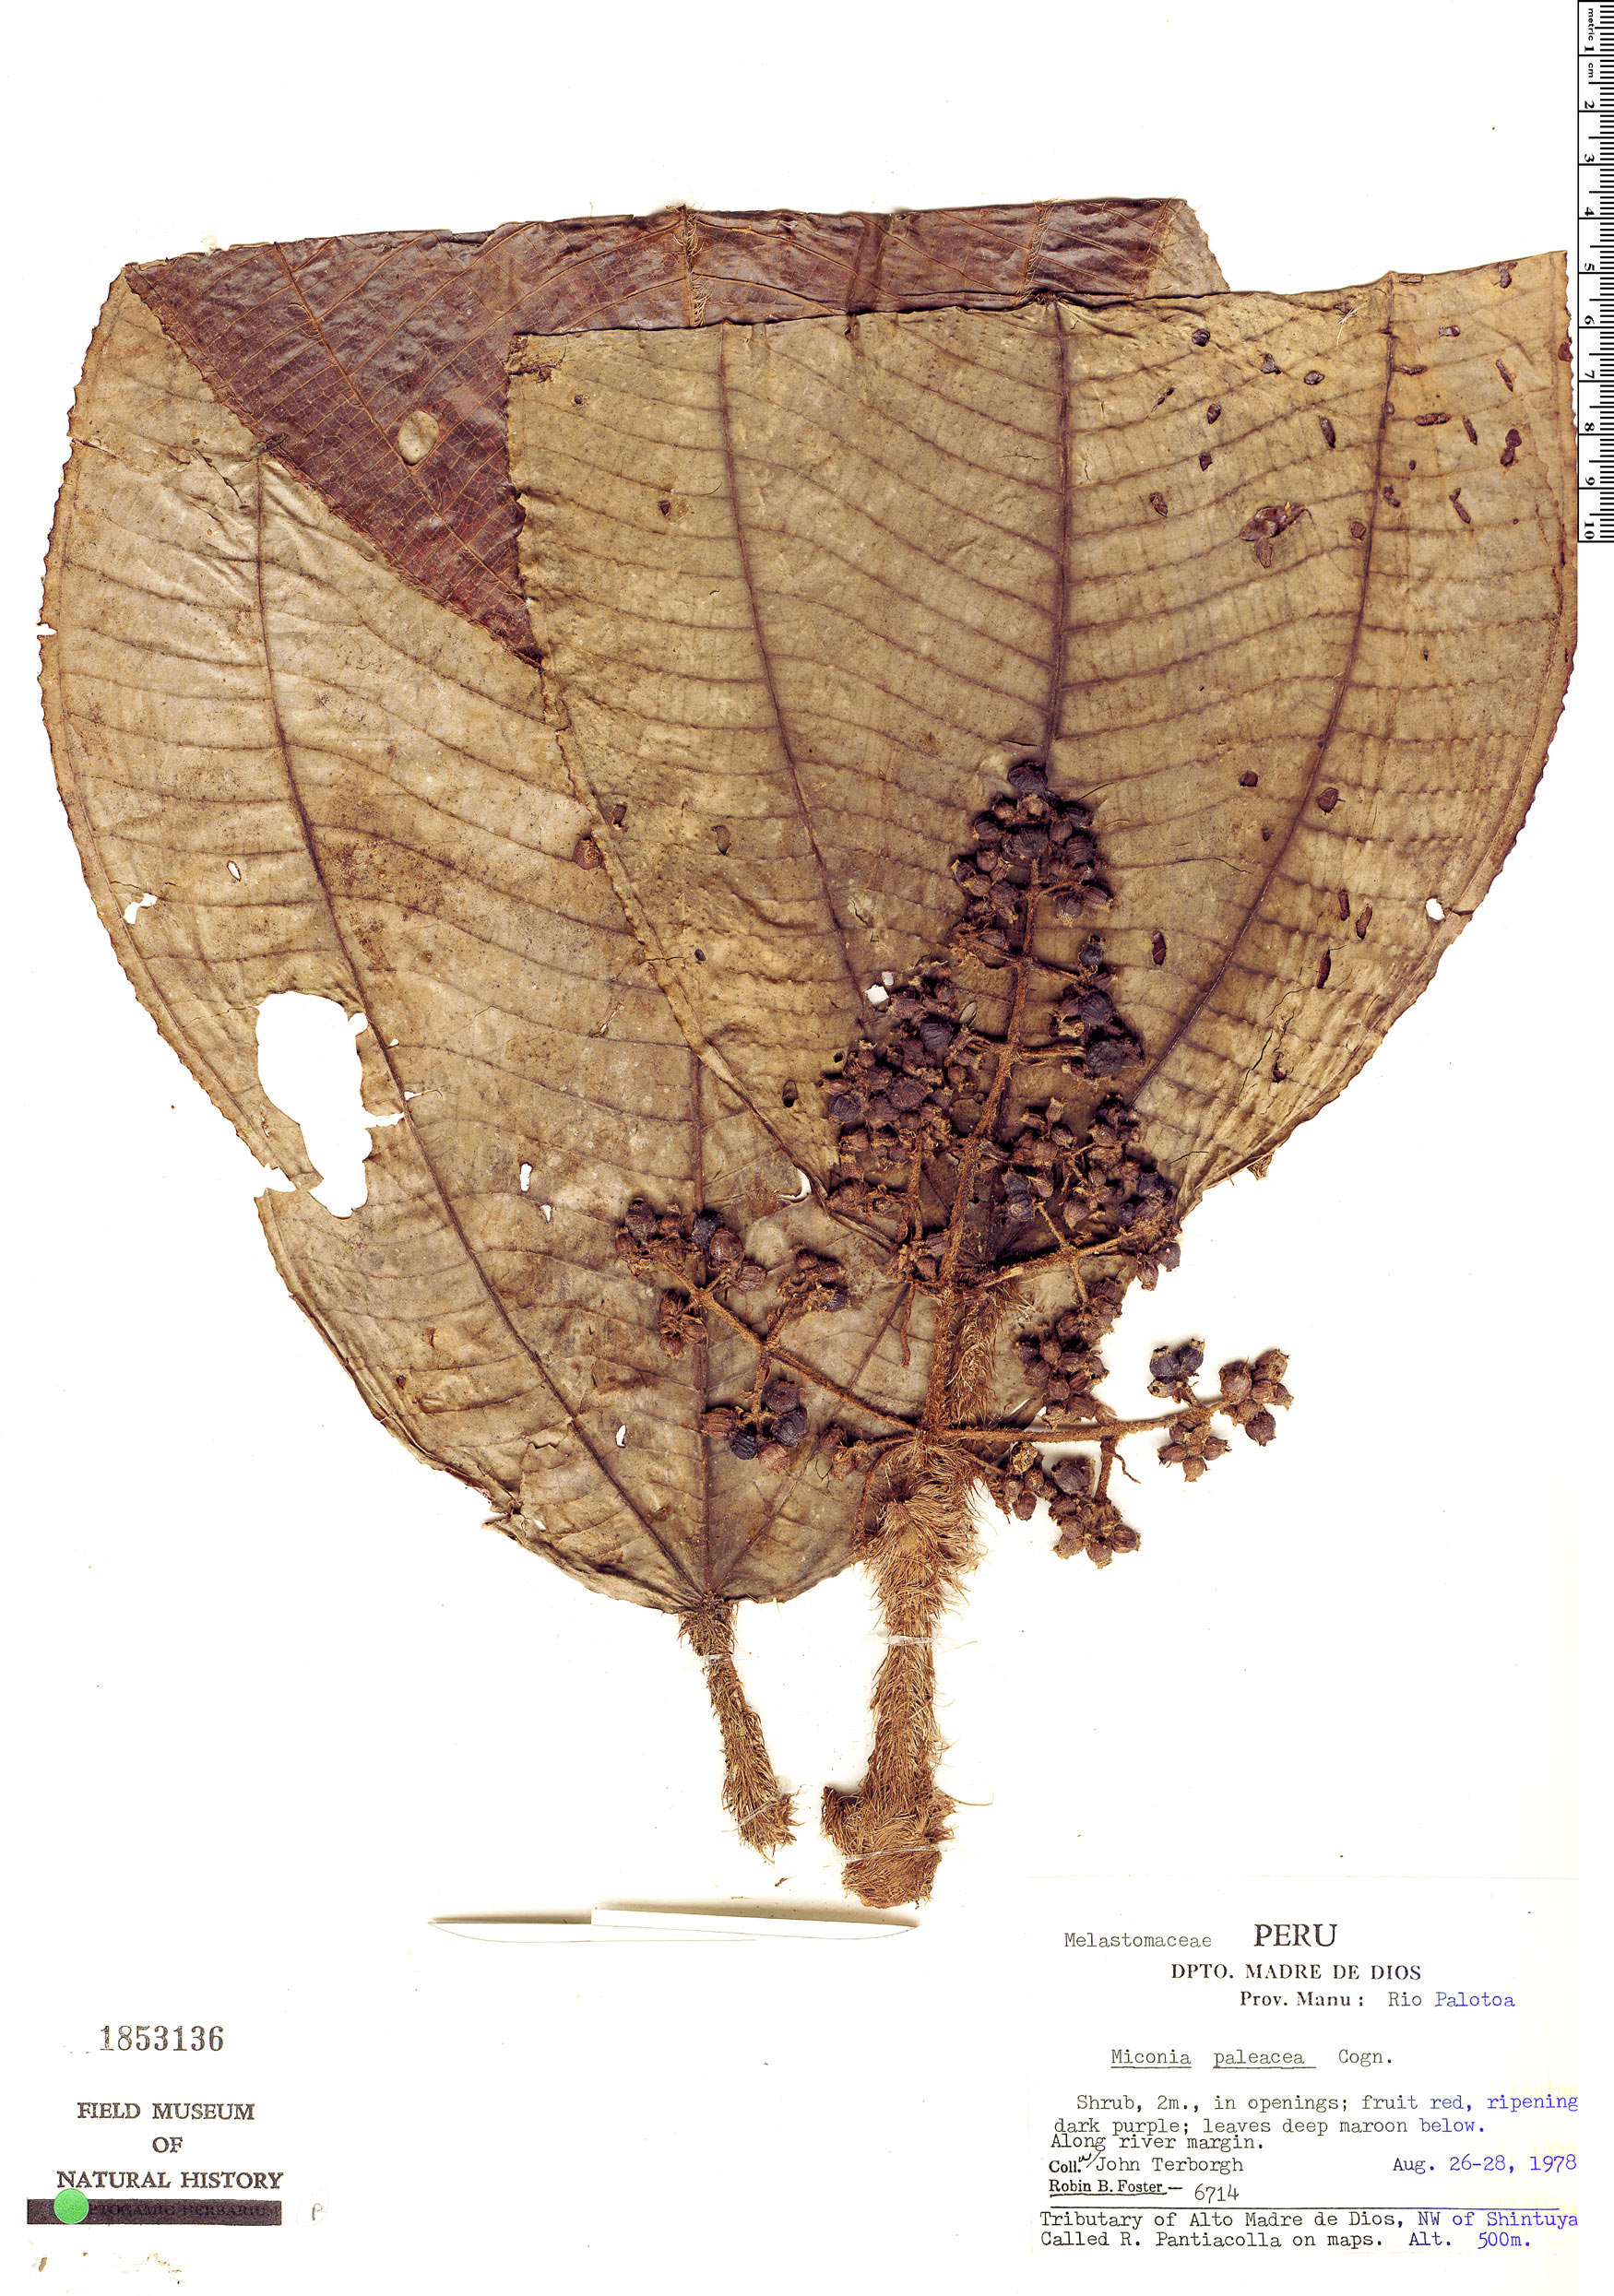 Specimen: Miconia paleacea